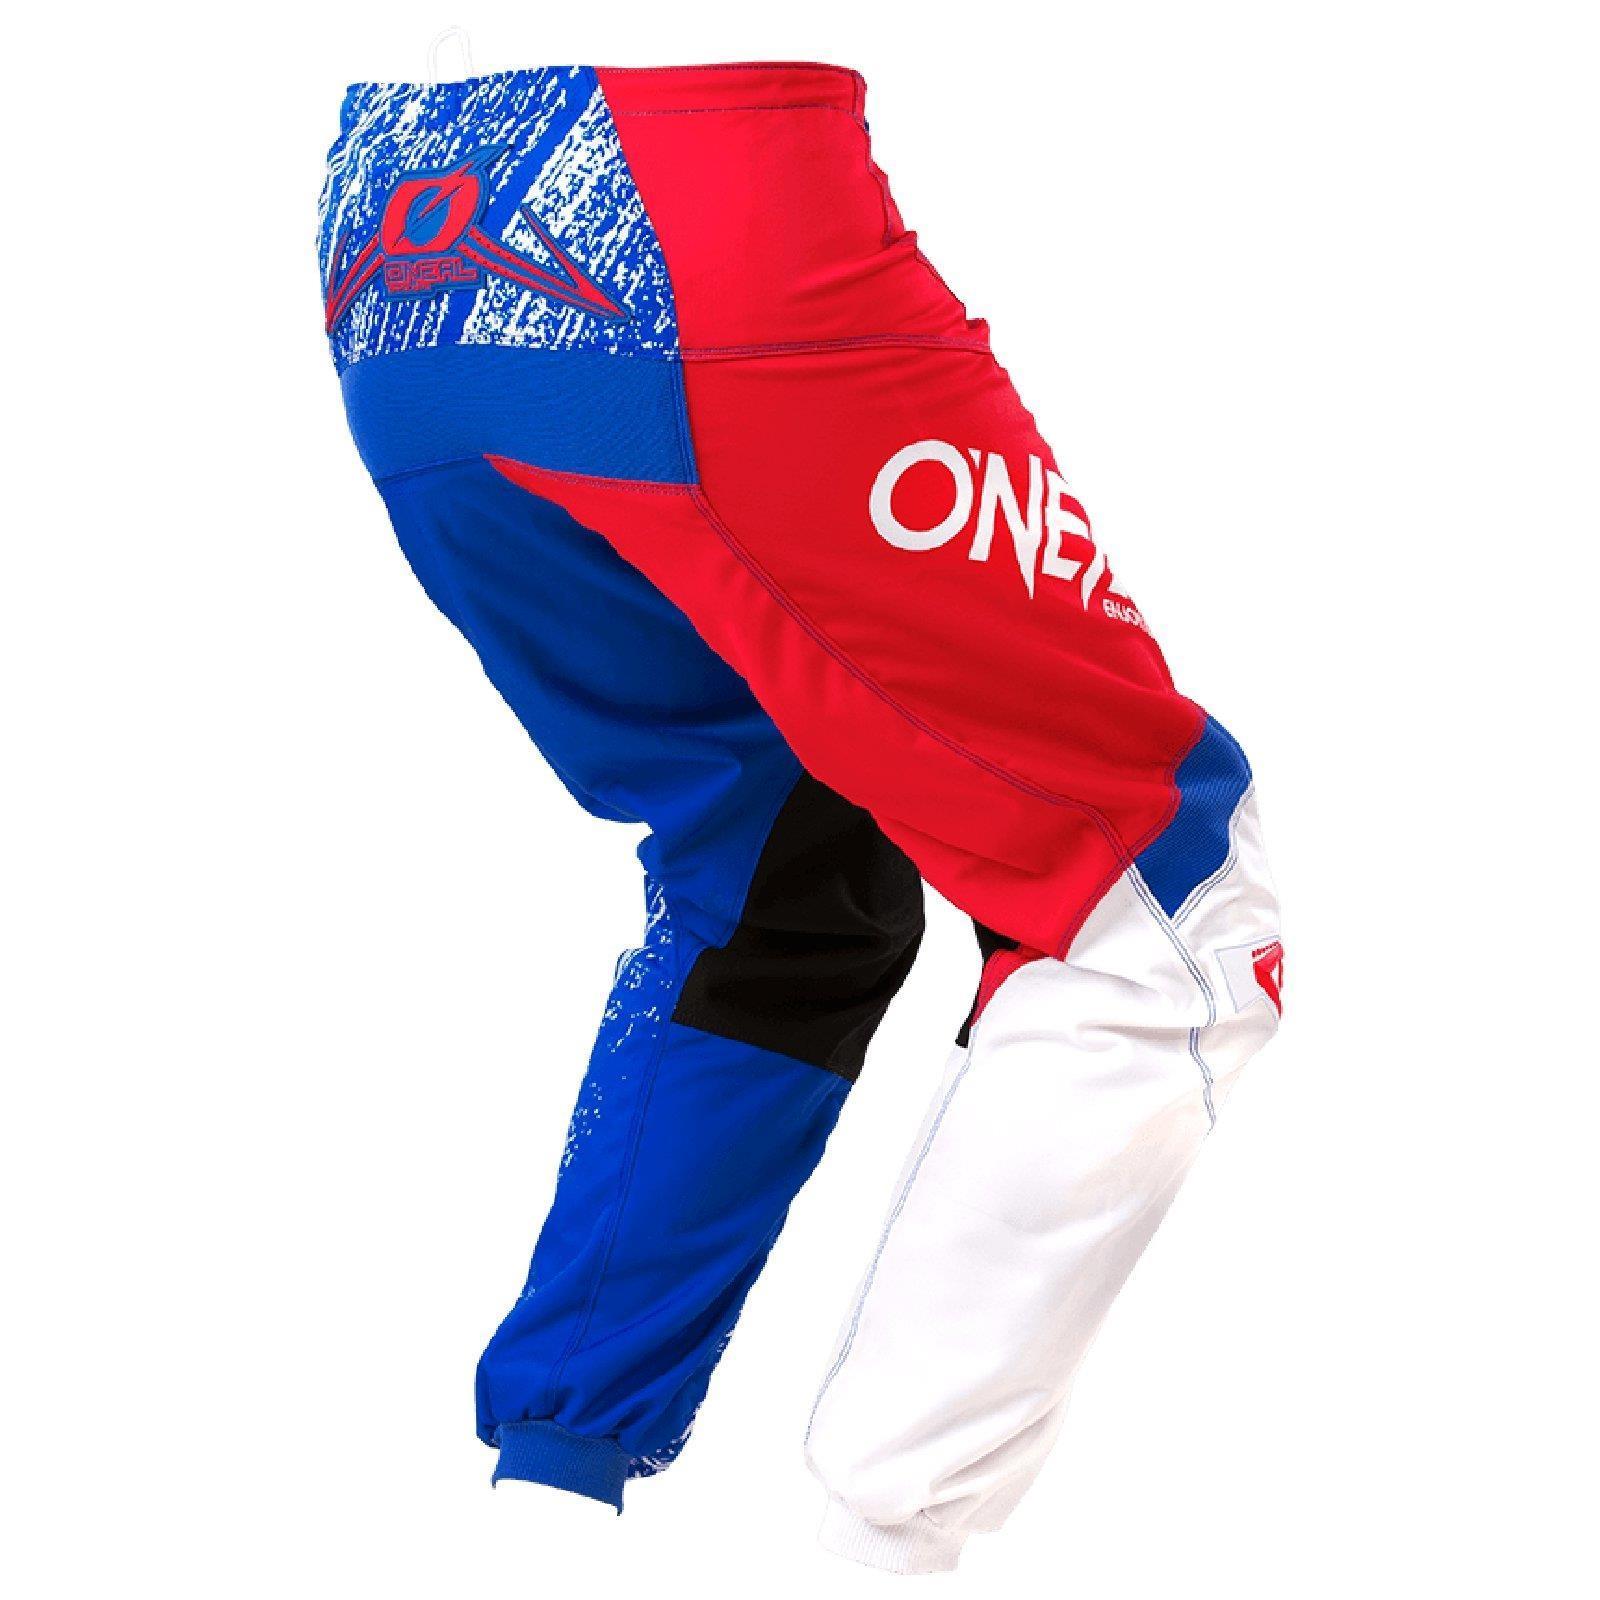 ONEAL-Element-Burnout-MX-Moto-Cross-Trousers-Pant-Enduro-Mountain-Bike-MTB-Downhill thumbnail 11